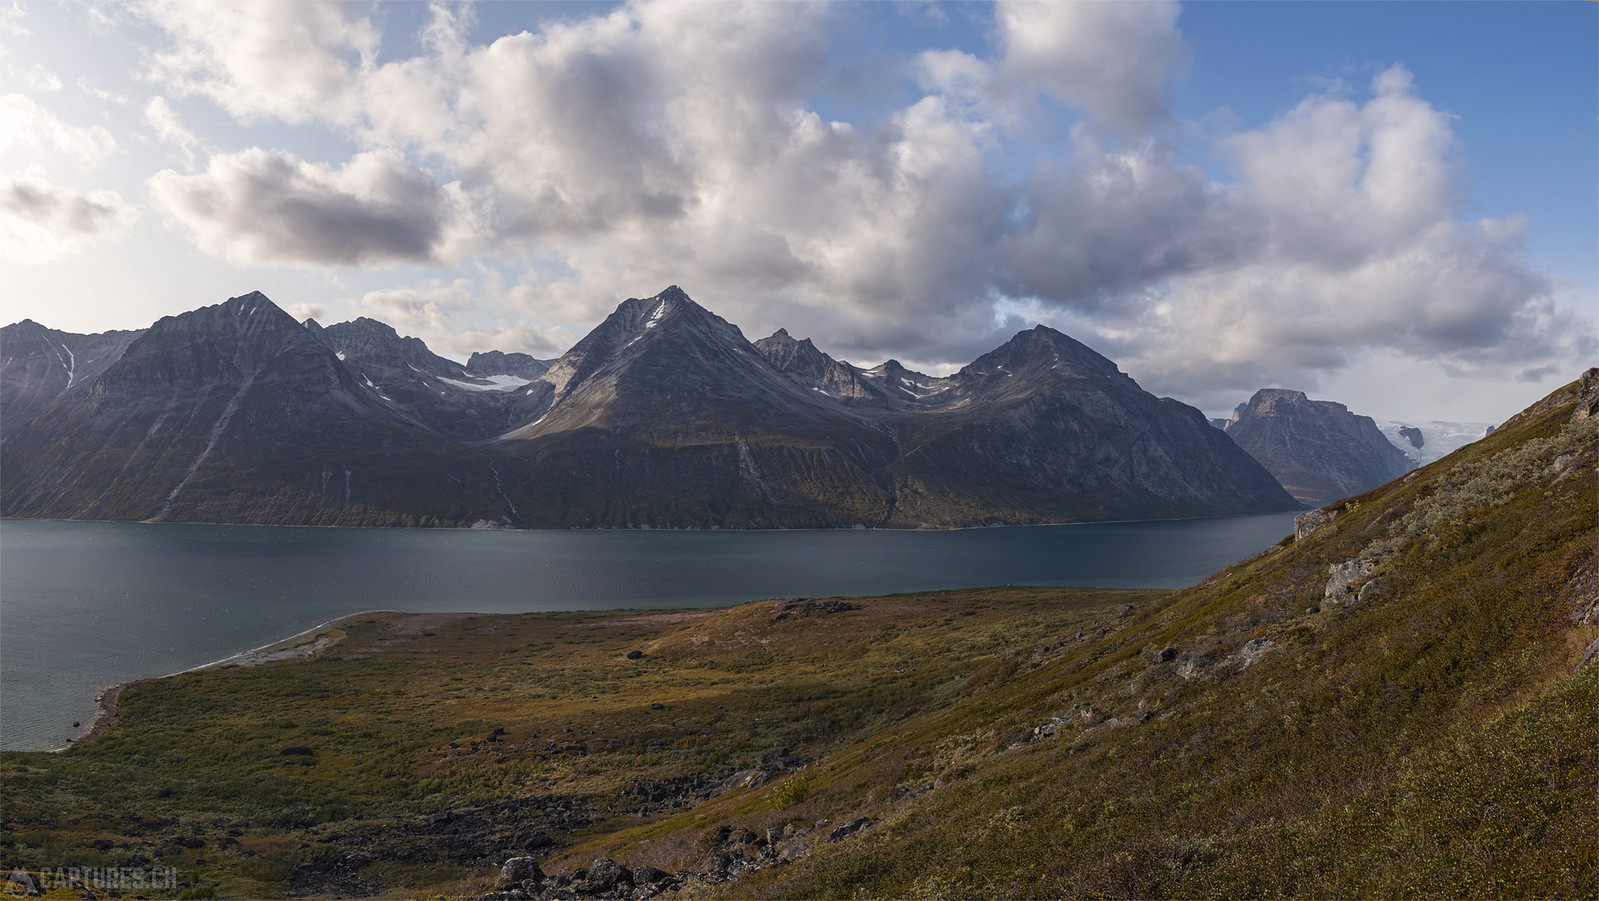 View in the Tasermiut Fjord - Tasermiut